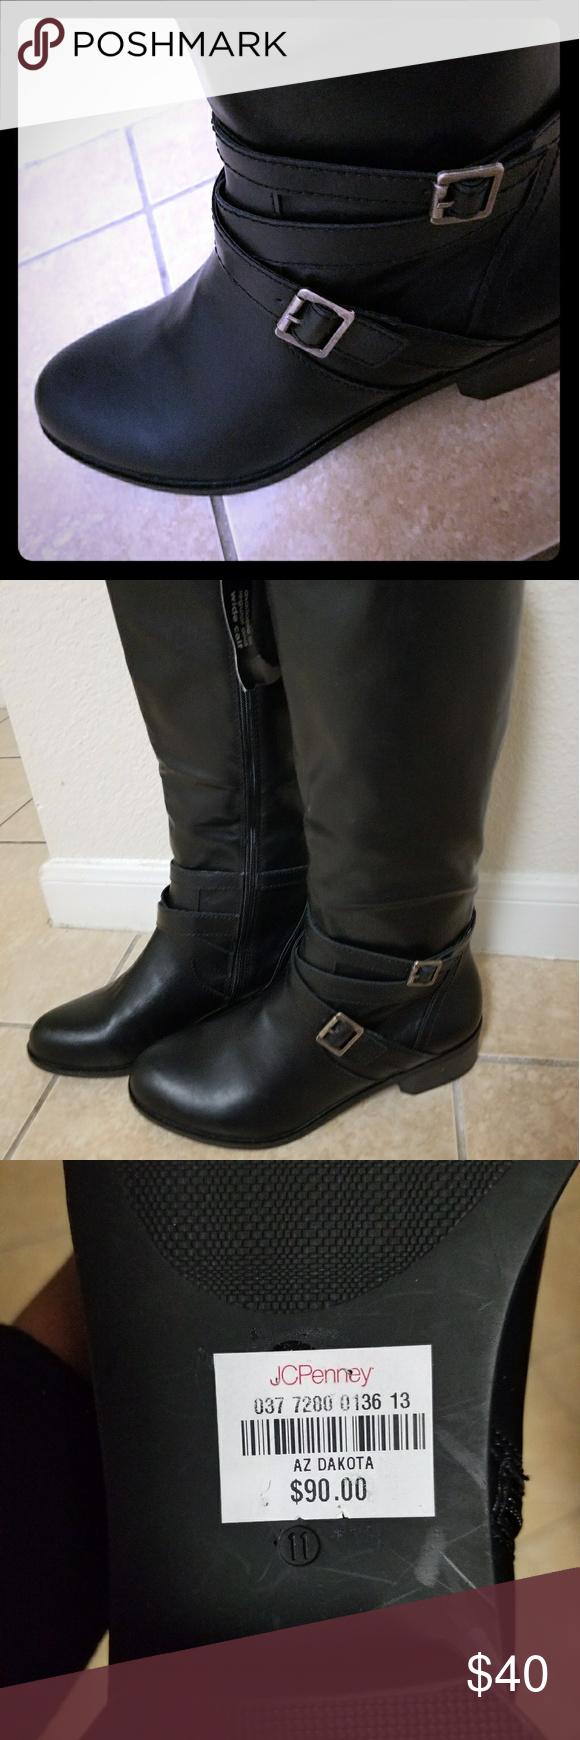 Women Boots size 11 wide calf | Boots